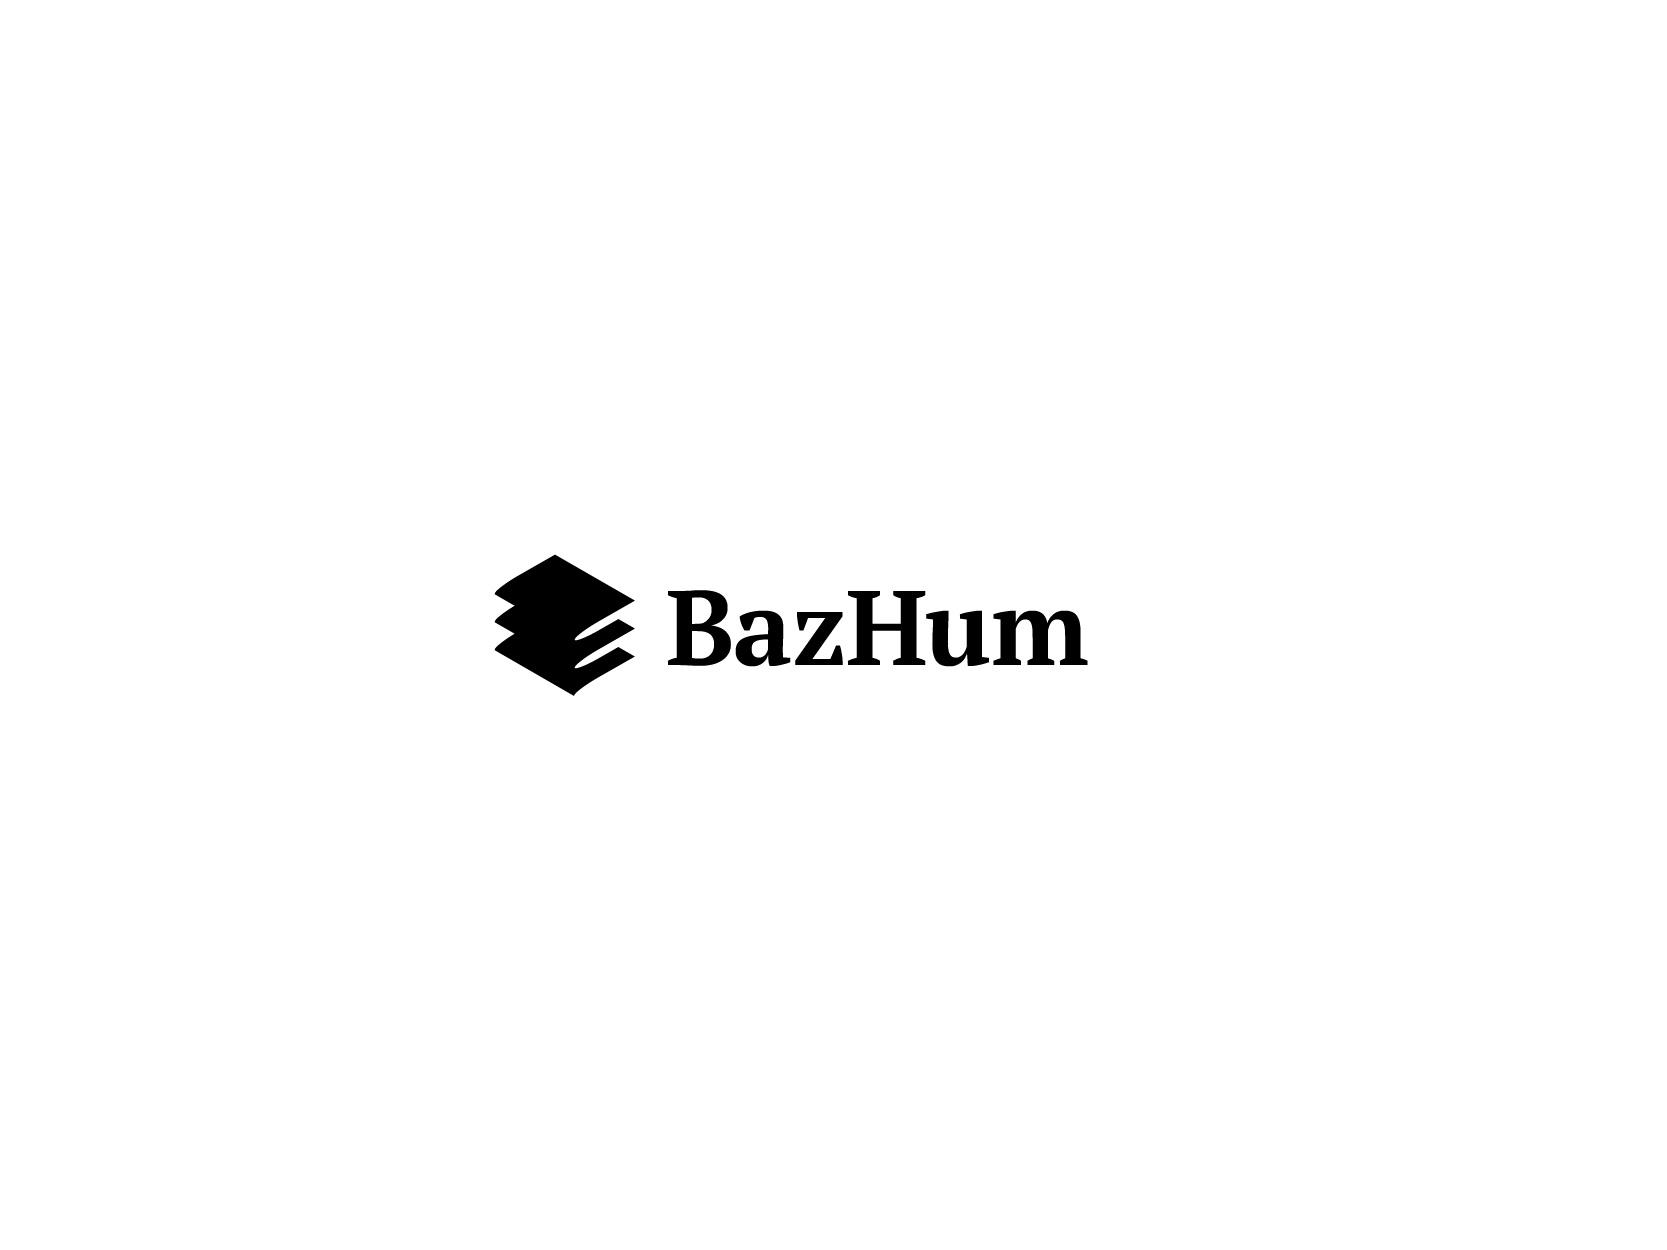 bazhum_logo-01